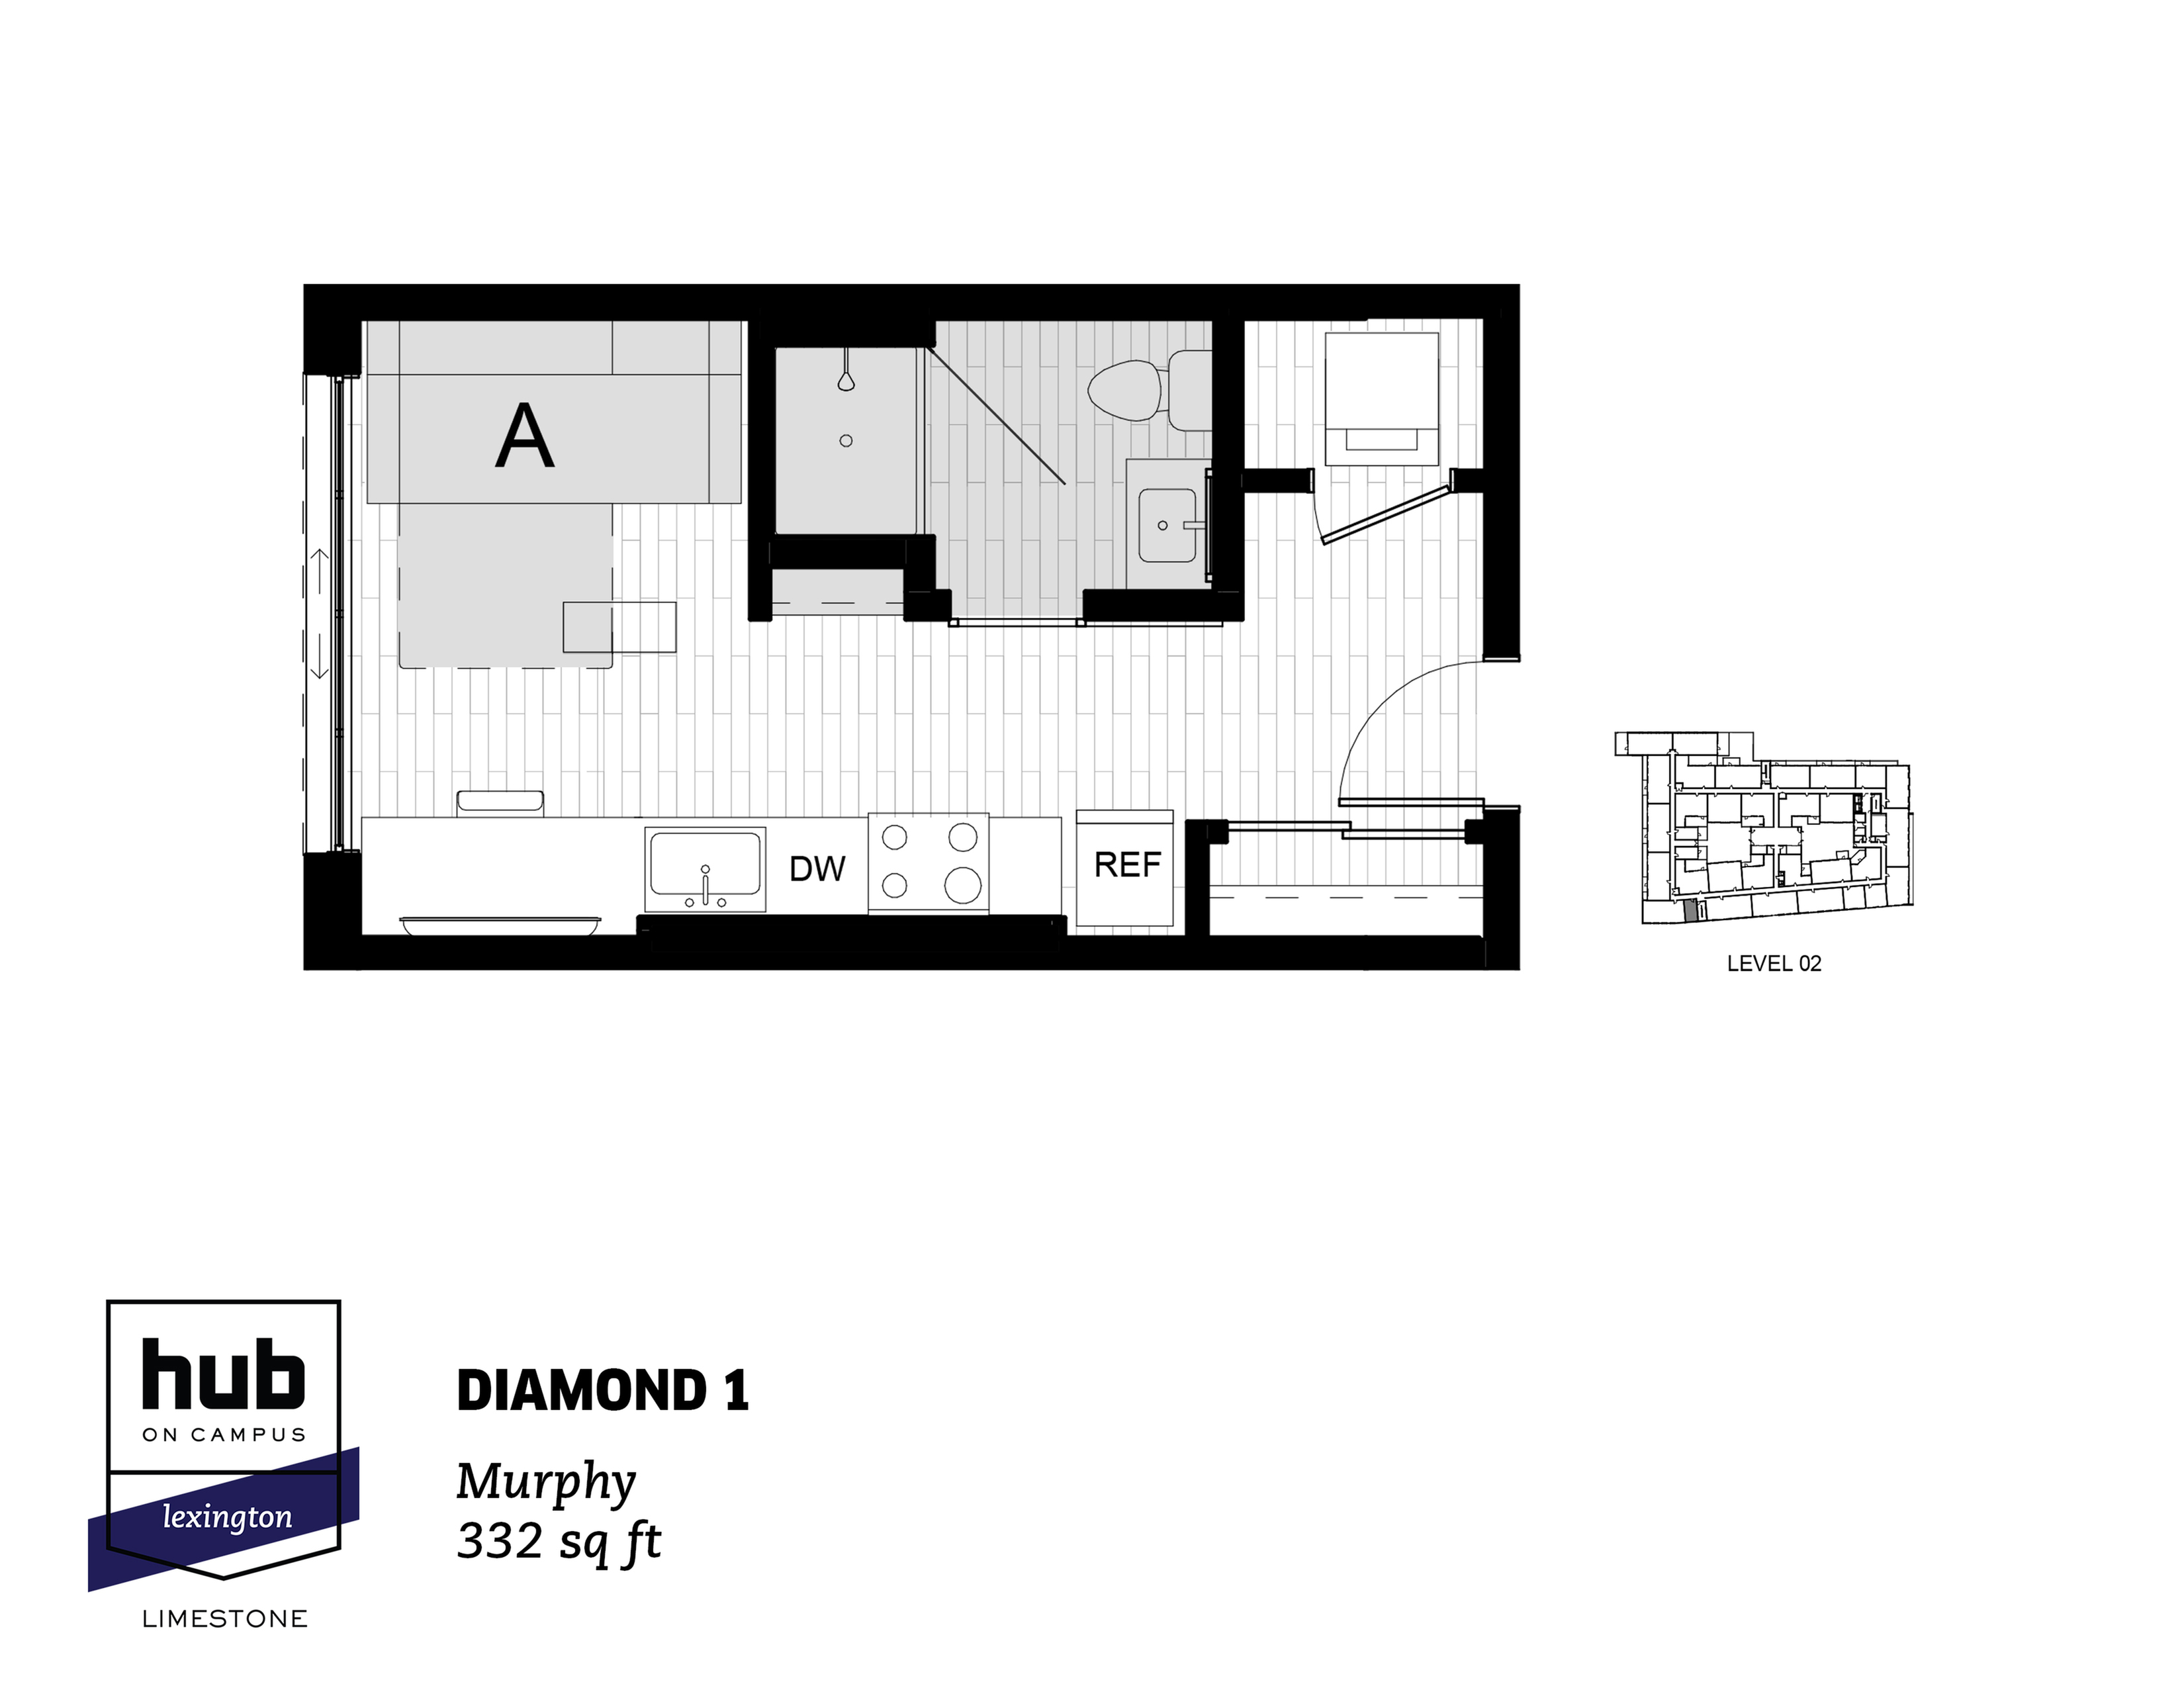 Diamond 1 Floorplan